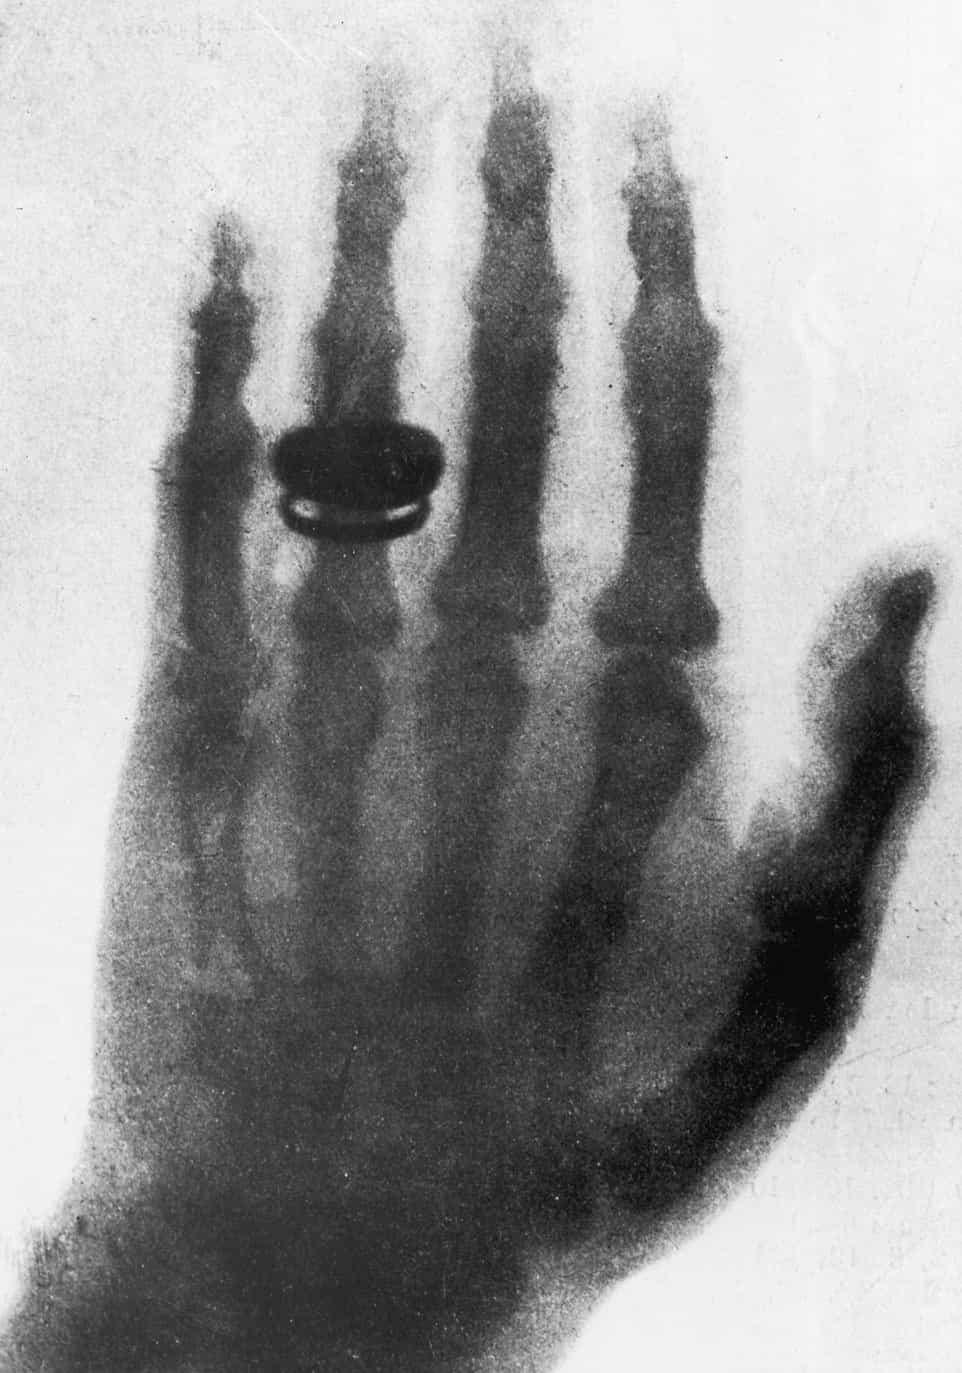 First X-ray (hand of Röntgen's wife)